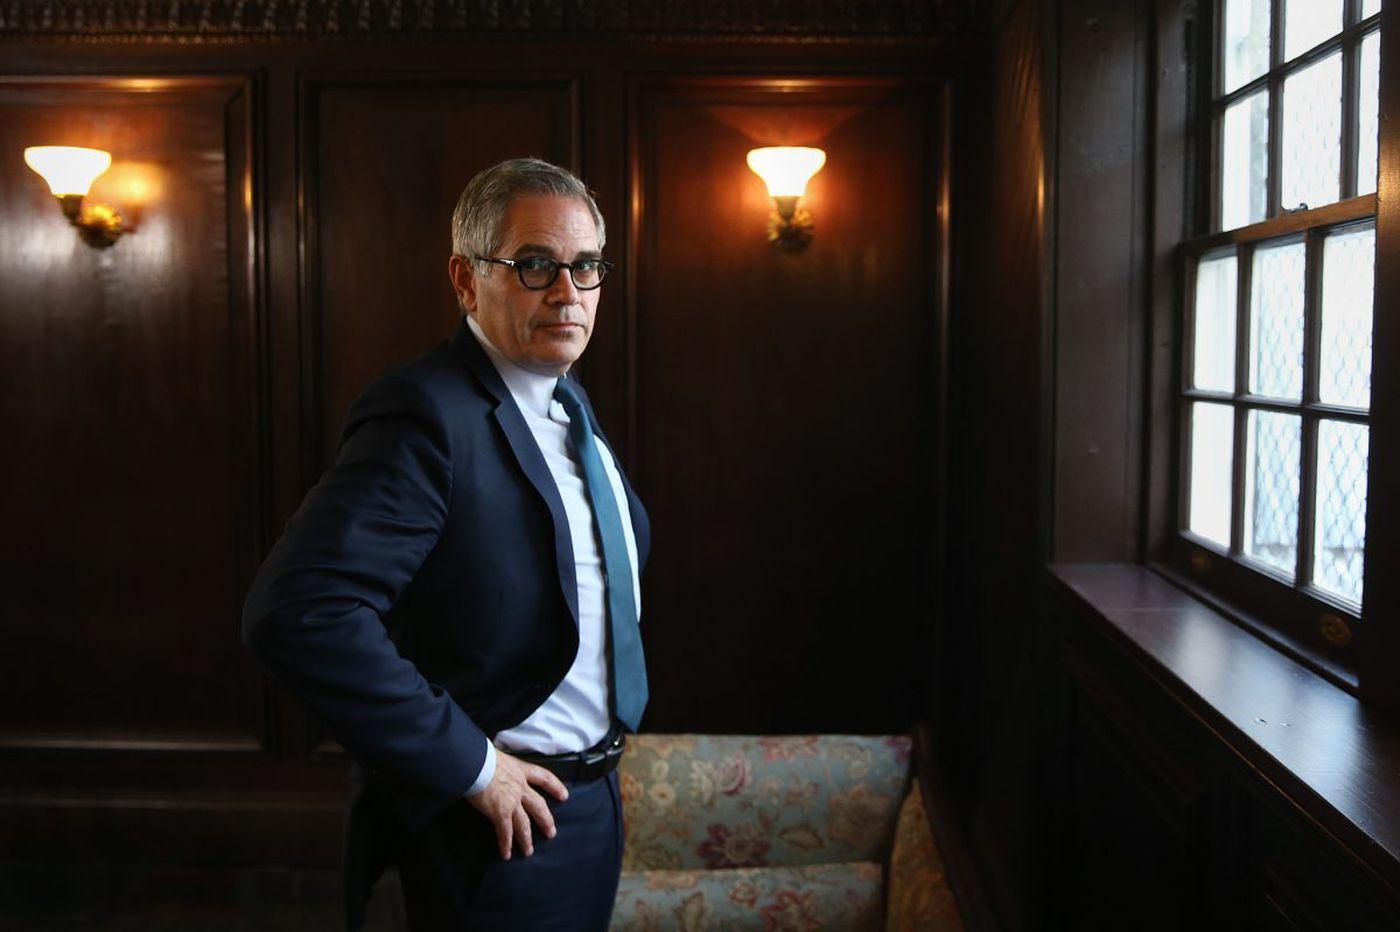 Larry Krasner needed to clean house in the D.A.'s office   Solomon Jones